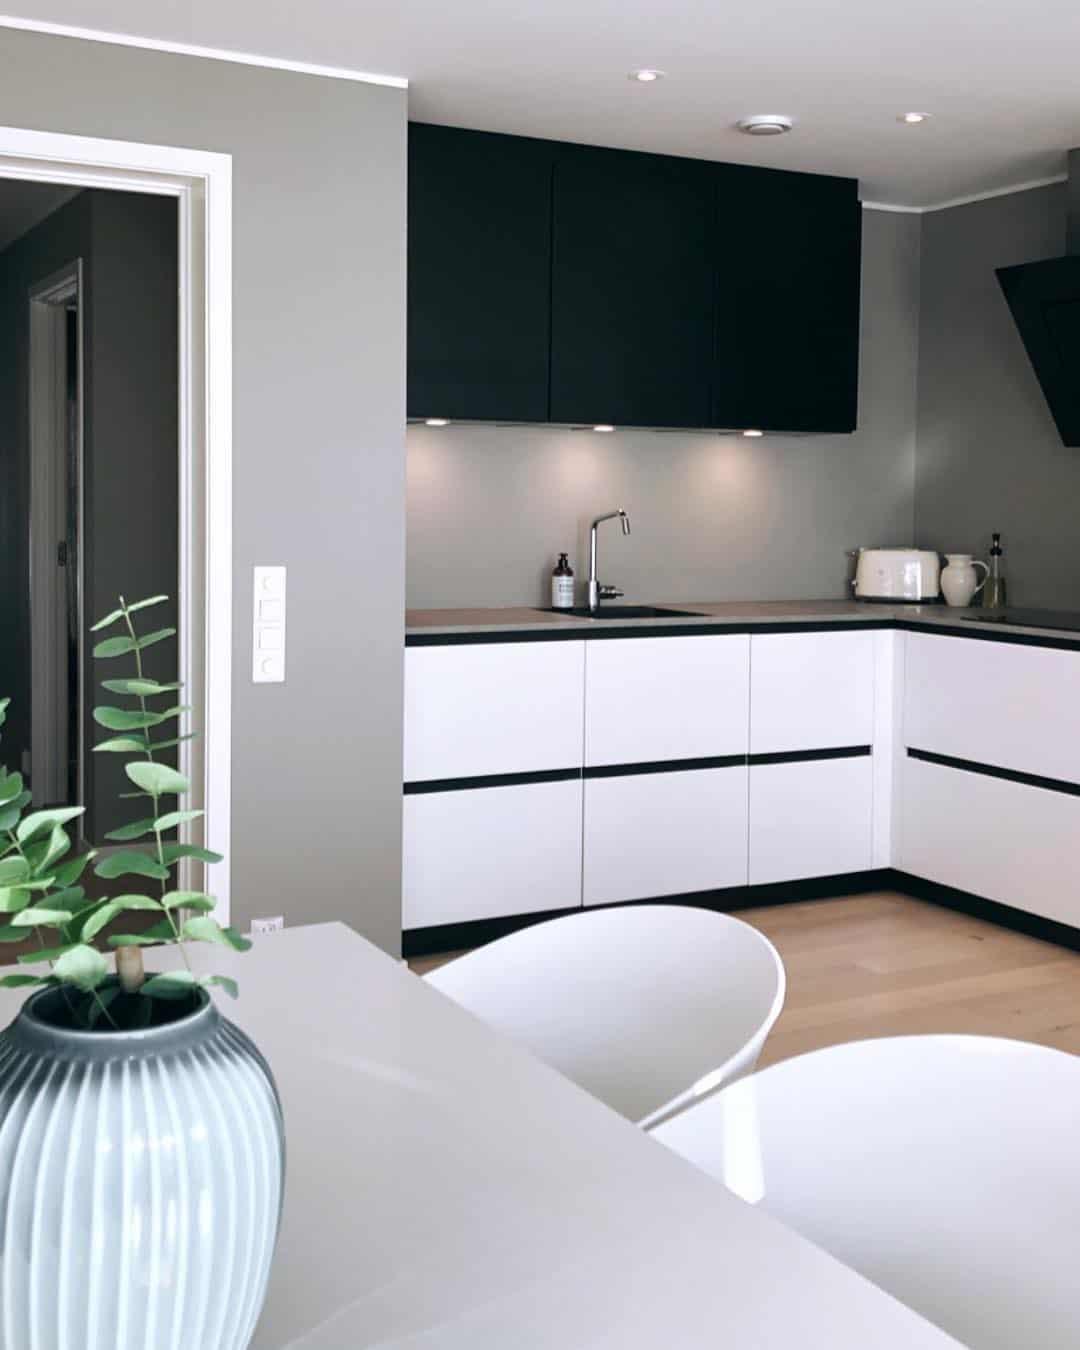 Kitchen Interior Design Rules